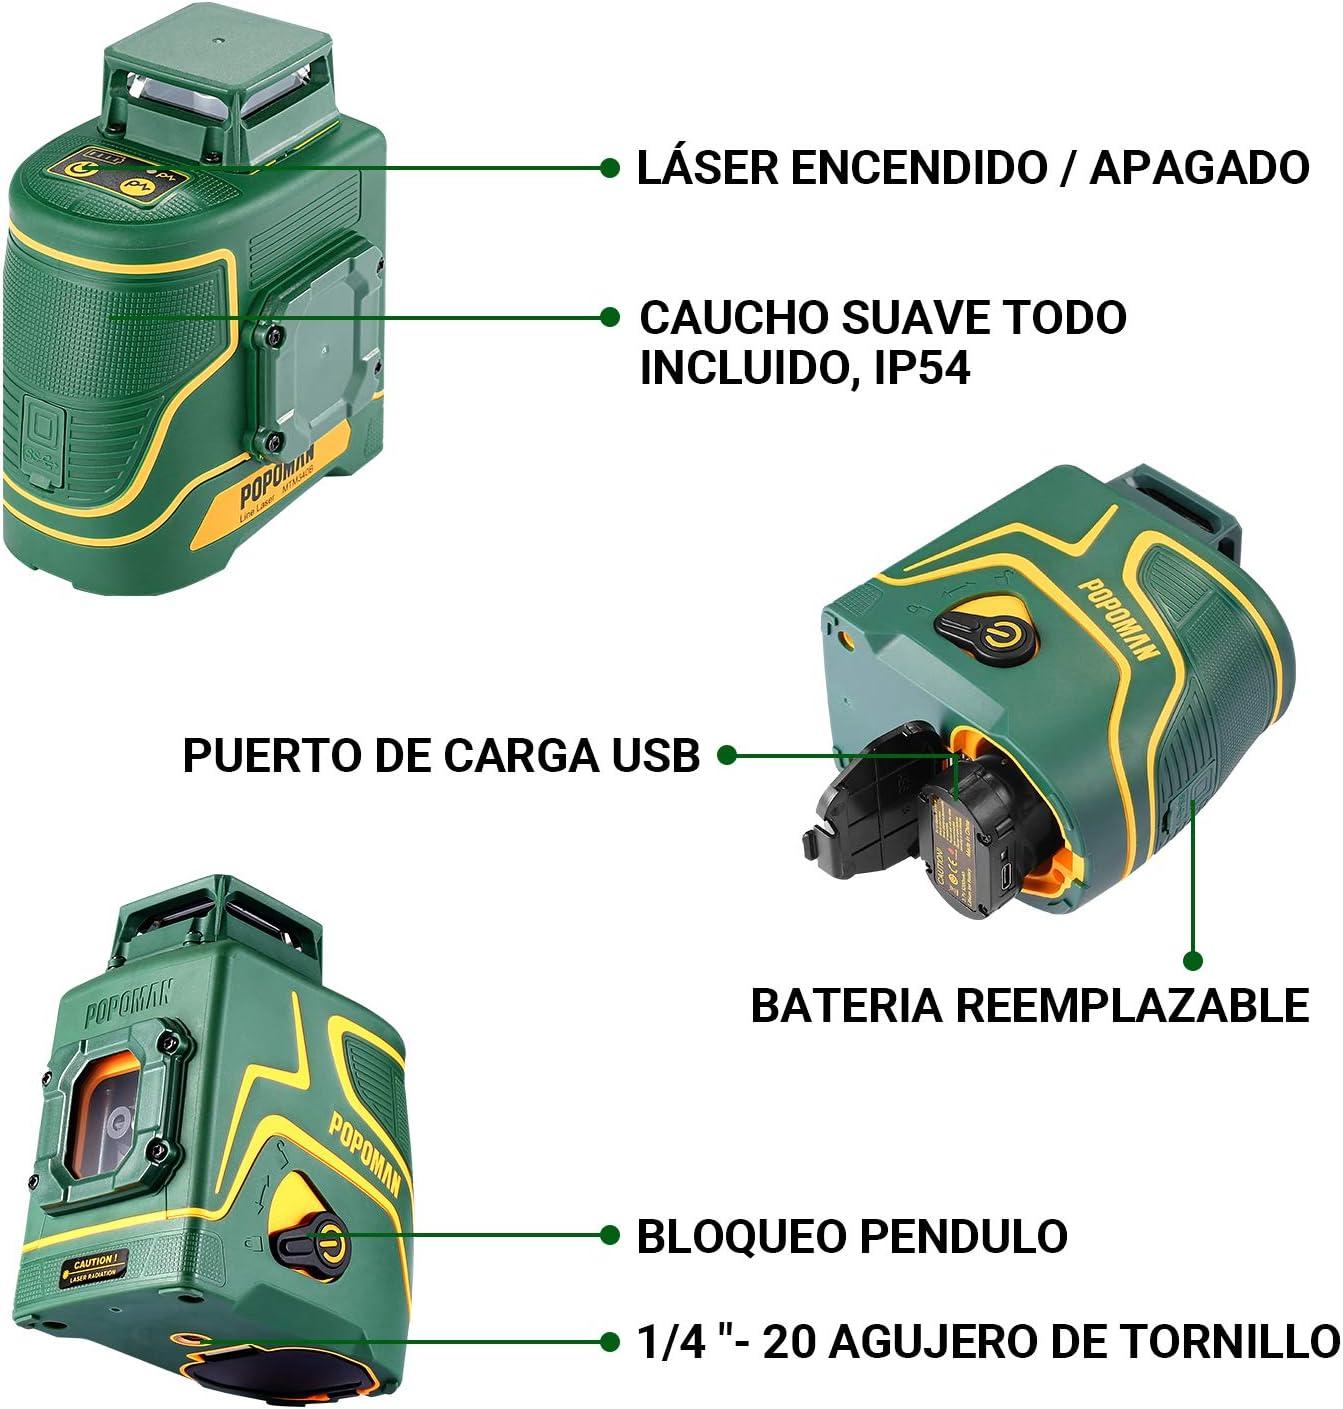 Modo pulsado externo Soporte Magn/ético Nivel l/áser 30m verde POPOMAN Carga USB y Bater/ía de litio 5 L/íneas y 360/° Giro Autonivelante IP54 MTM330B 1x360/° l/ínea l/áser Bolsa de transporte